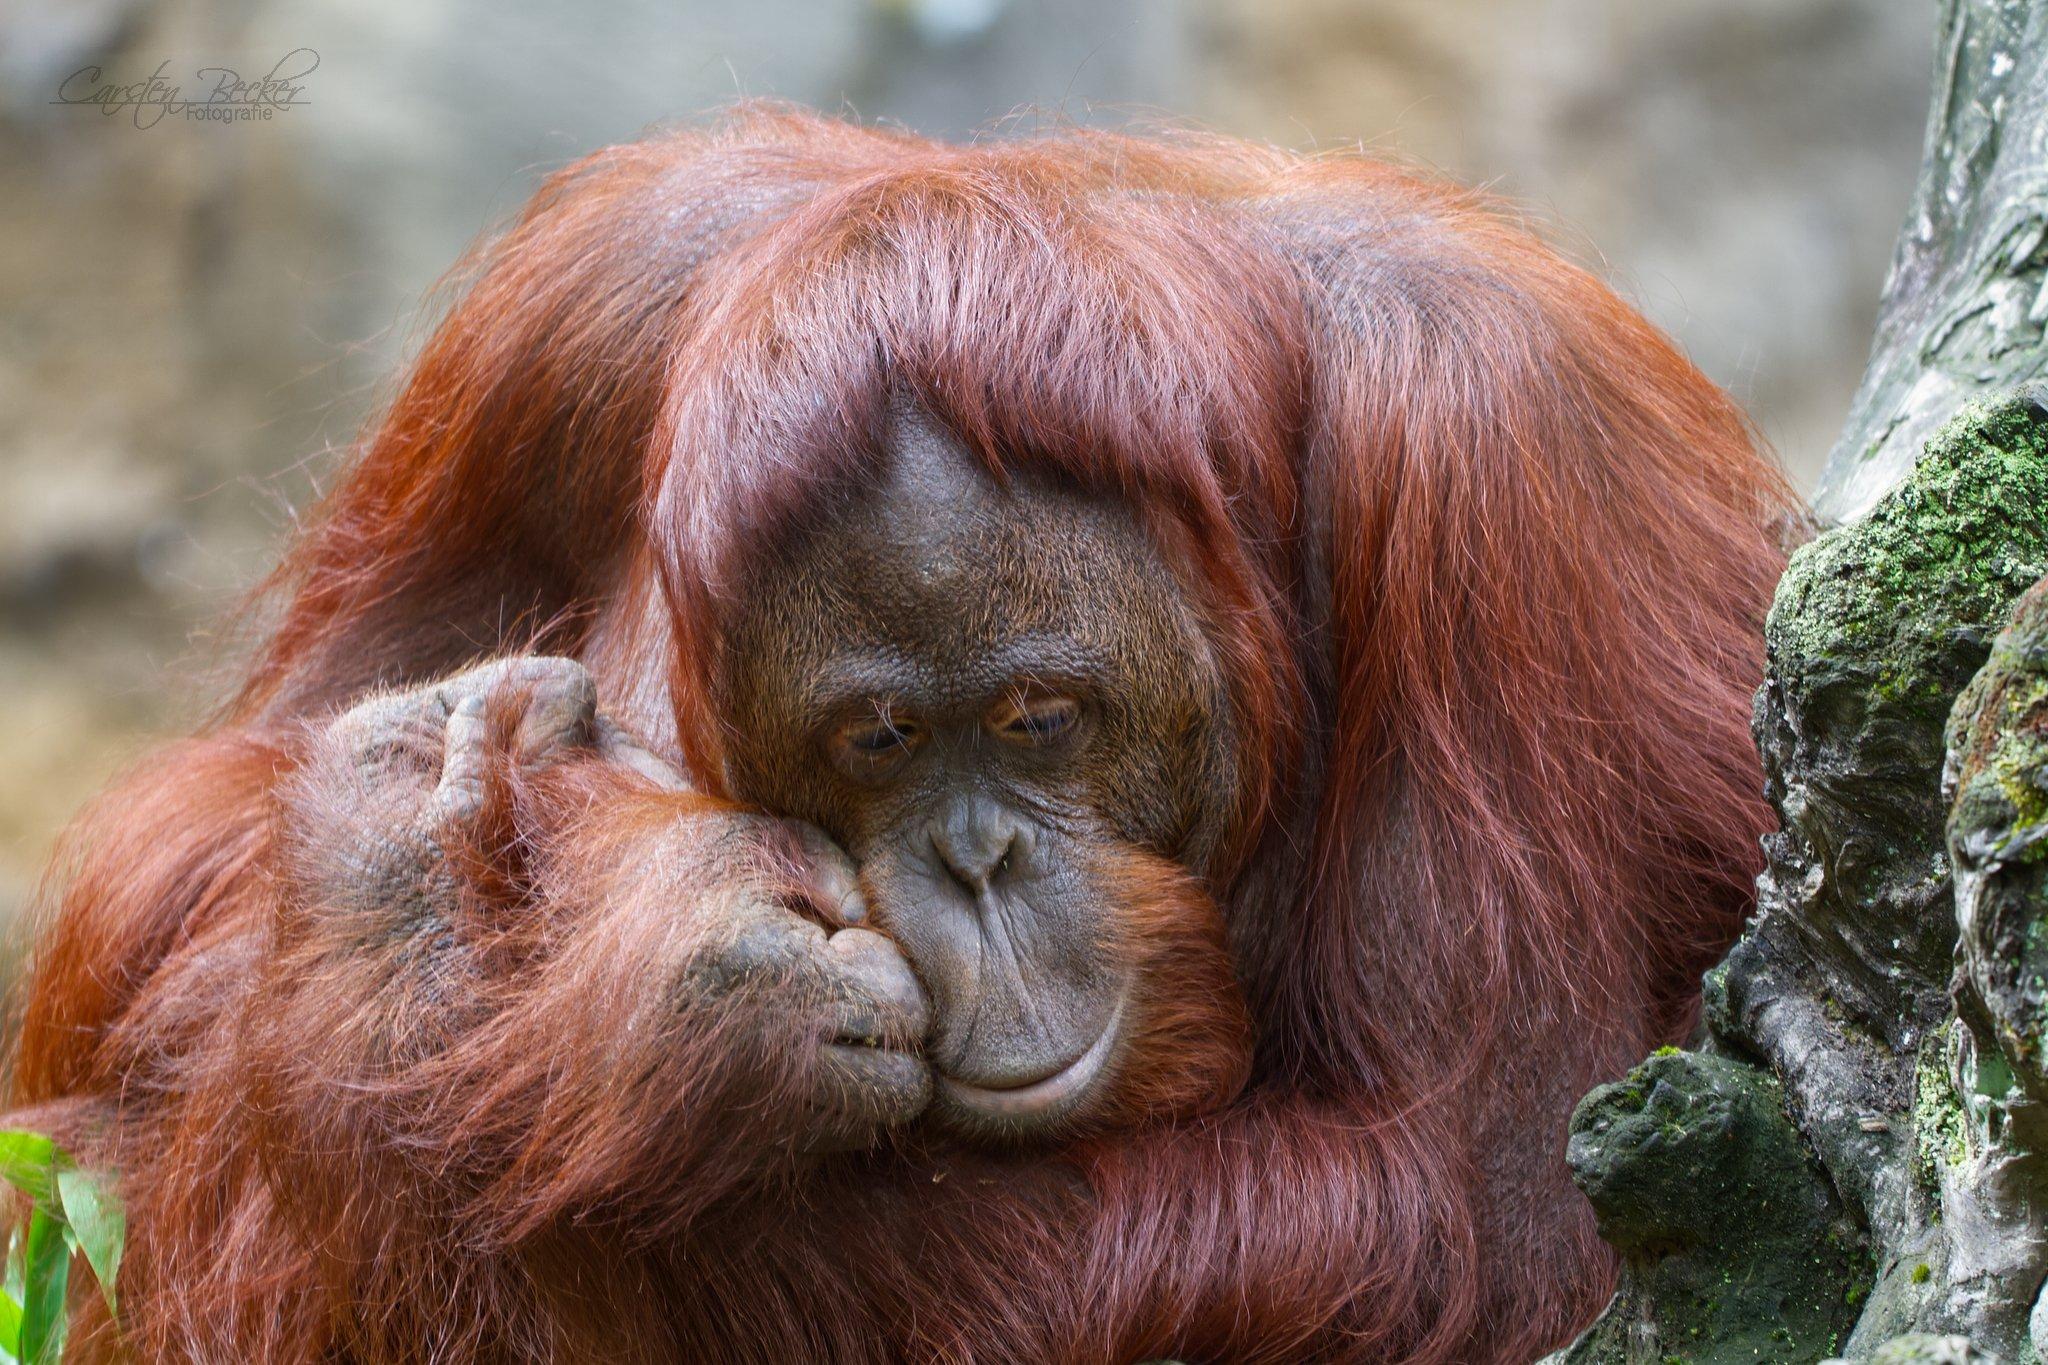 20190913_zoomuenster_orangutan_016904567802870608862